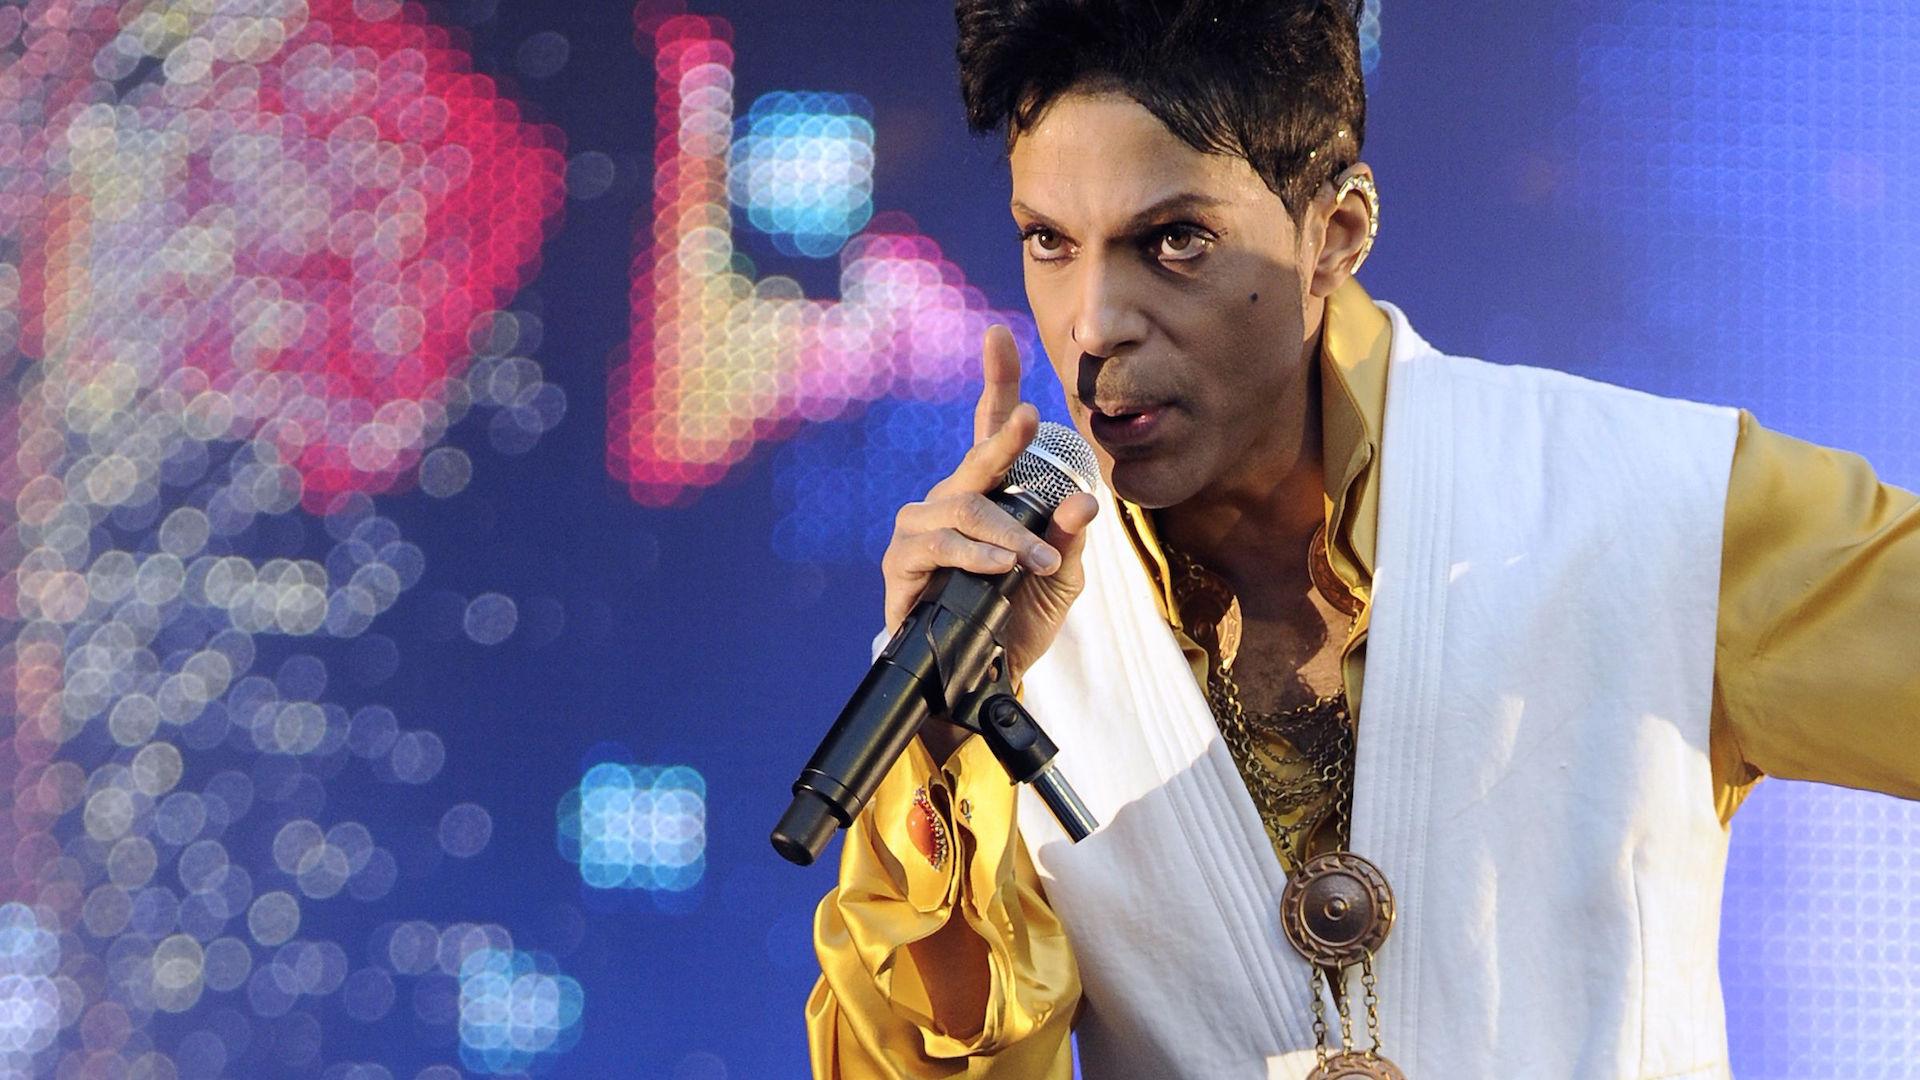 'Defying description': ZZ Top's Billy Gibbons on Prince the 'sensational' guitarist